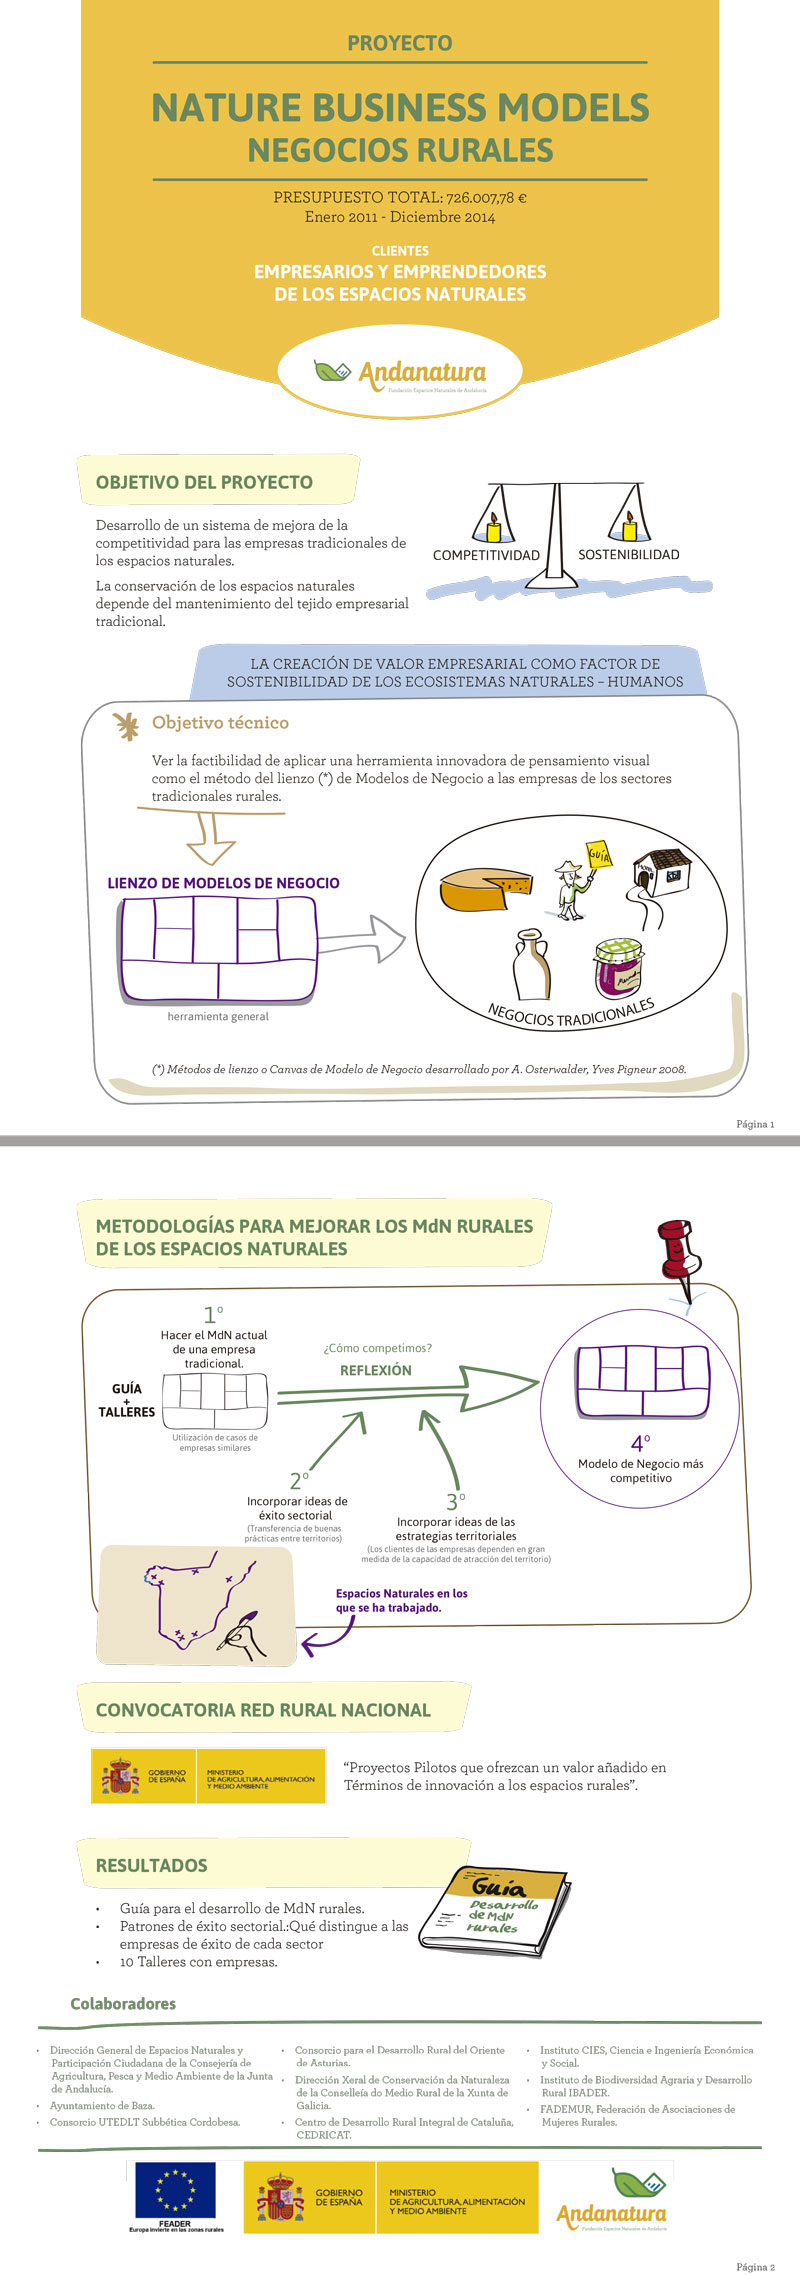 Andantura_Ficha_Proyecto_NatureBusinessModel_NegociosRurales_Web_PopUp